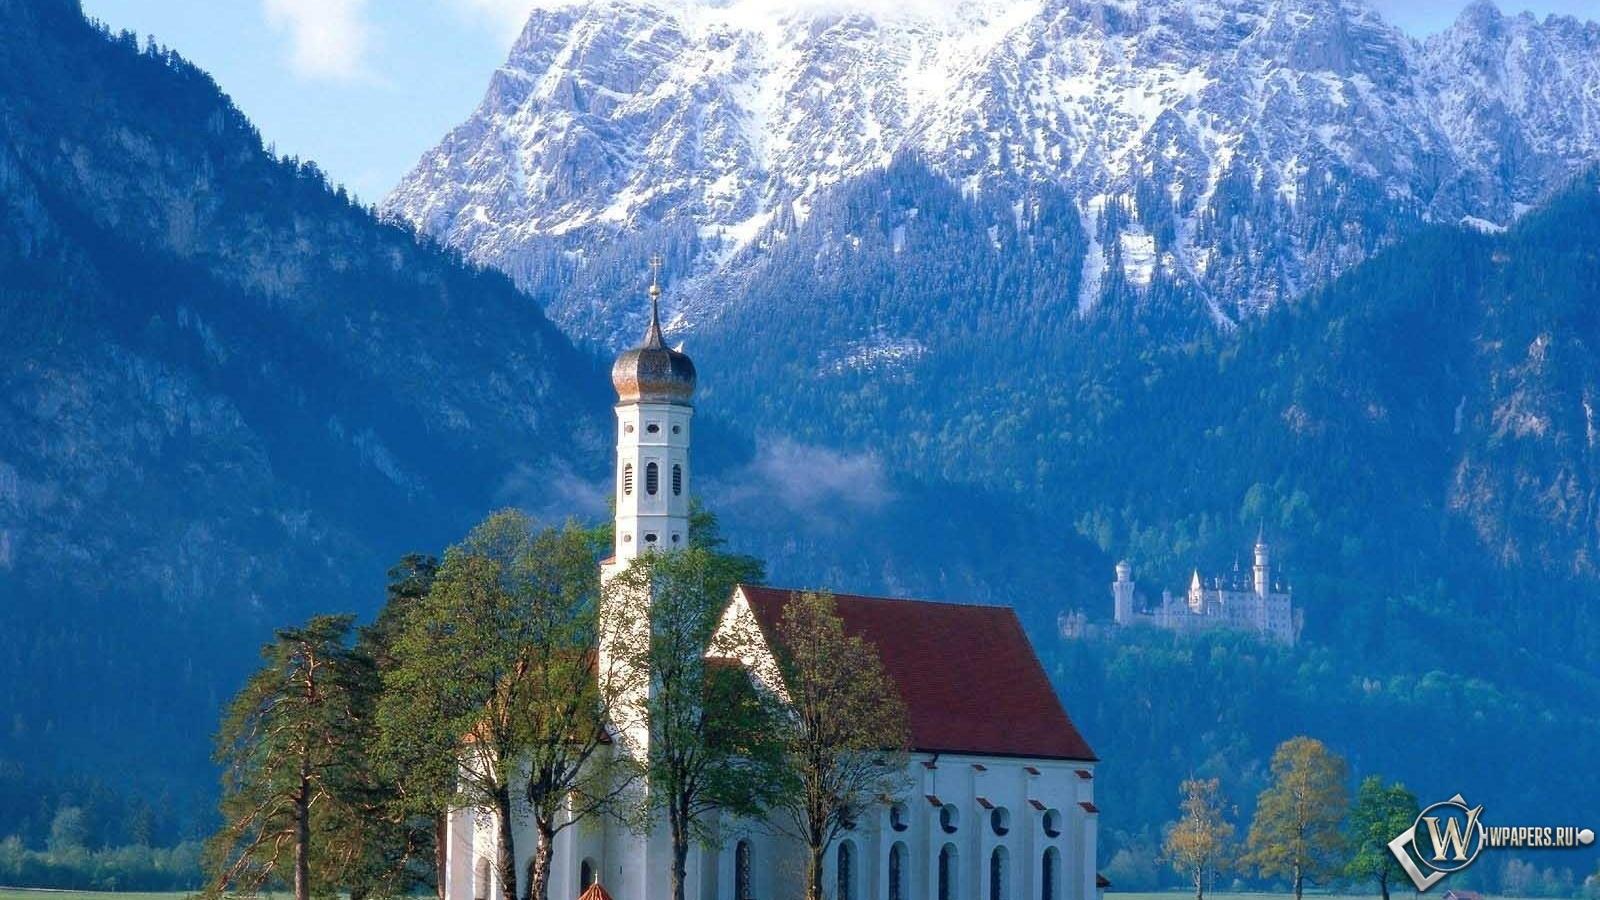 Церковь в Баварии Германия 1600x900